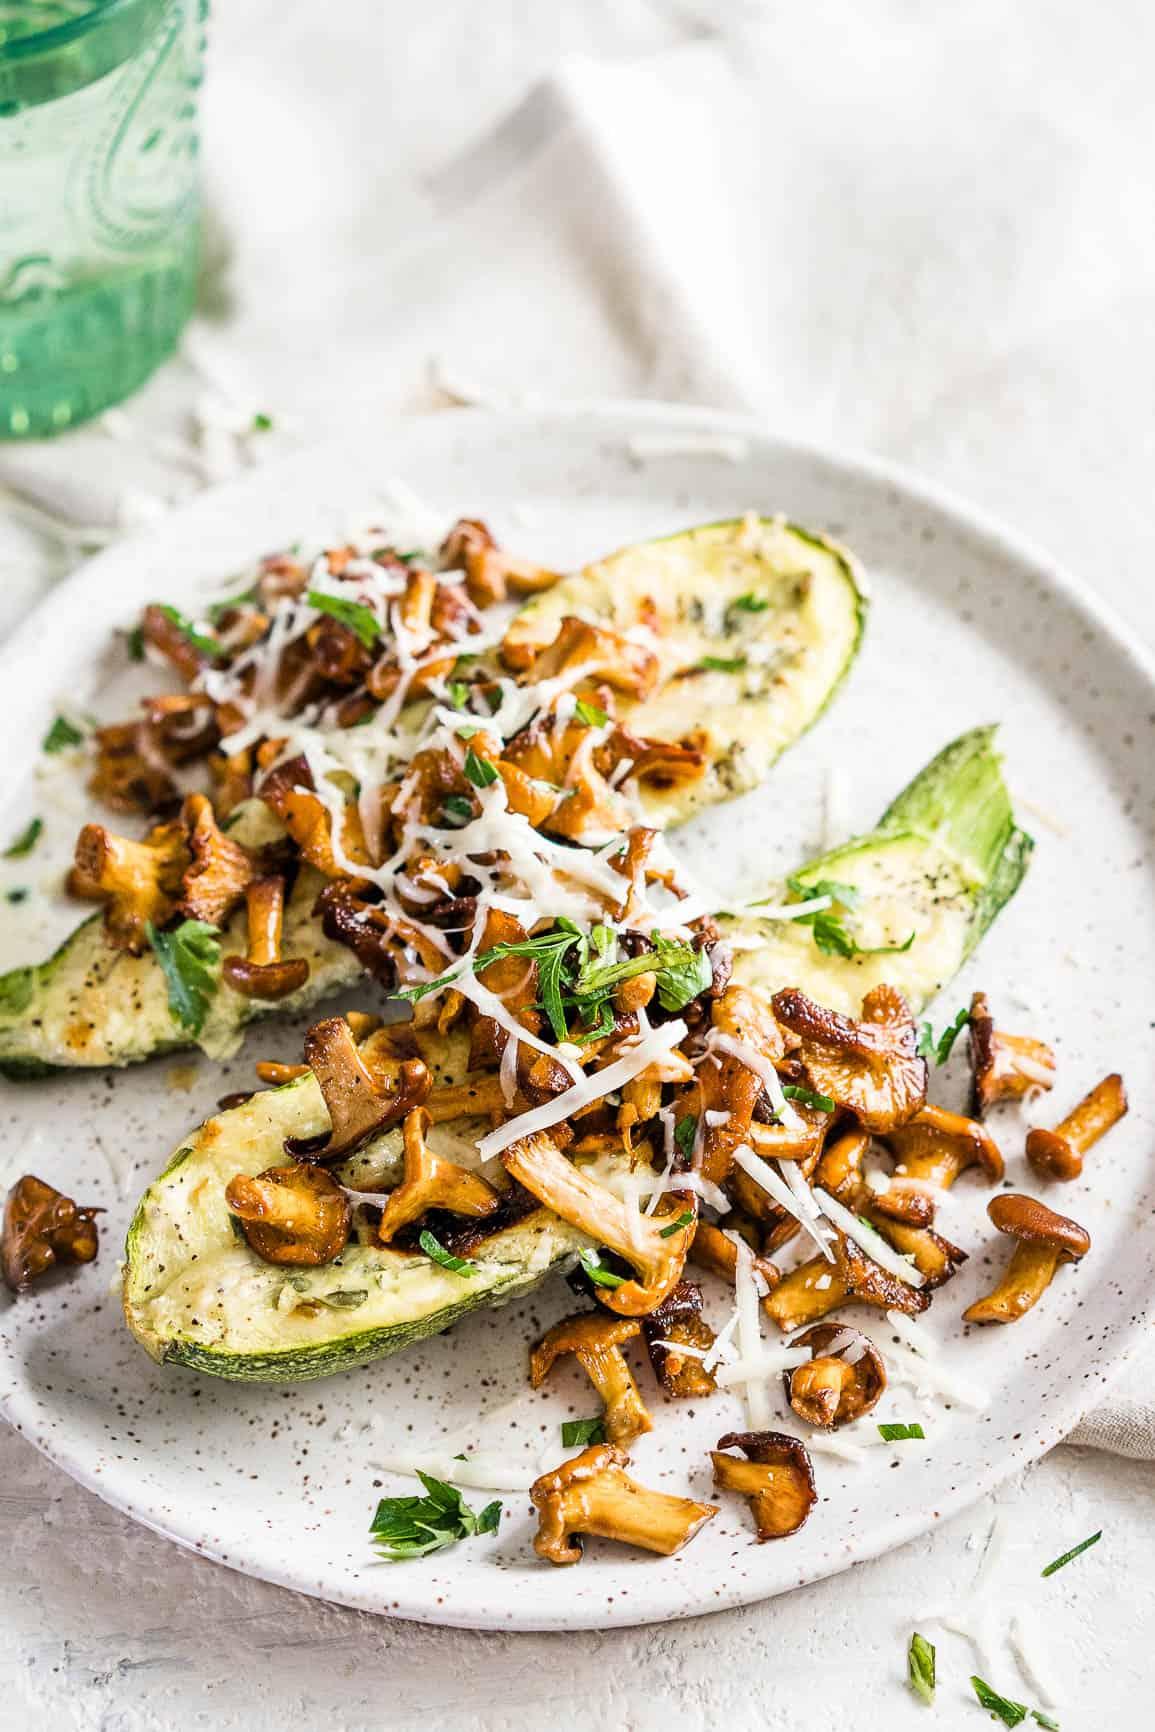 Keto Cheese Stuffed Zucchini Boats topped with Chanterelle Mushrooms